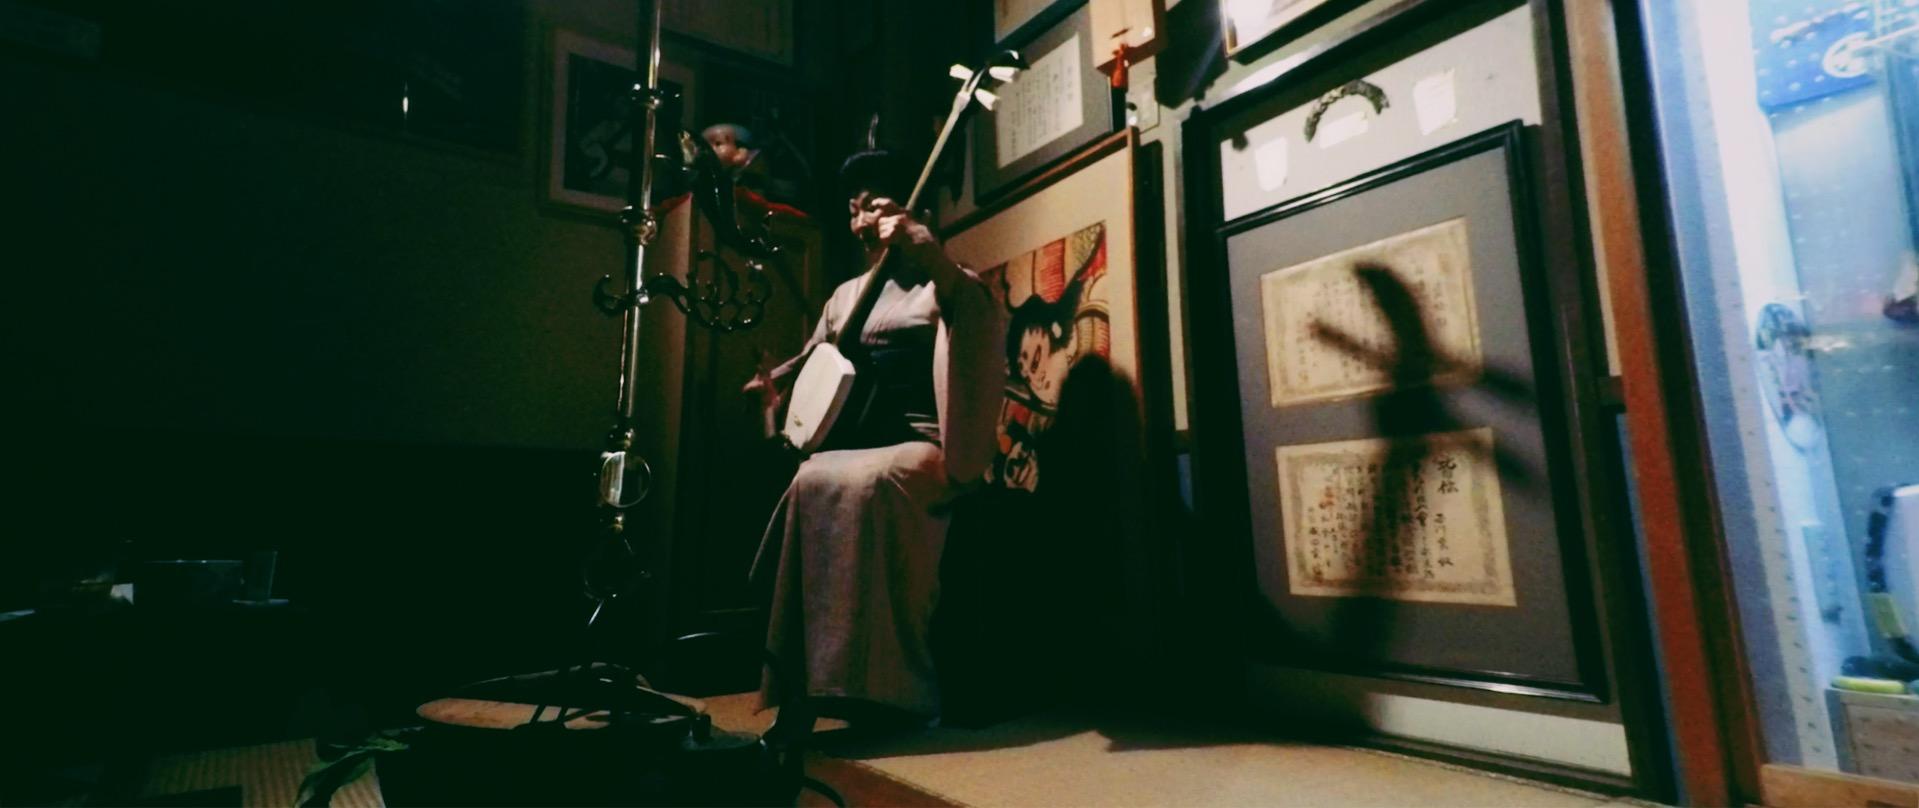 Youko Nishikawa playing Tsugarujamisen in Aomori, Japan